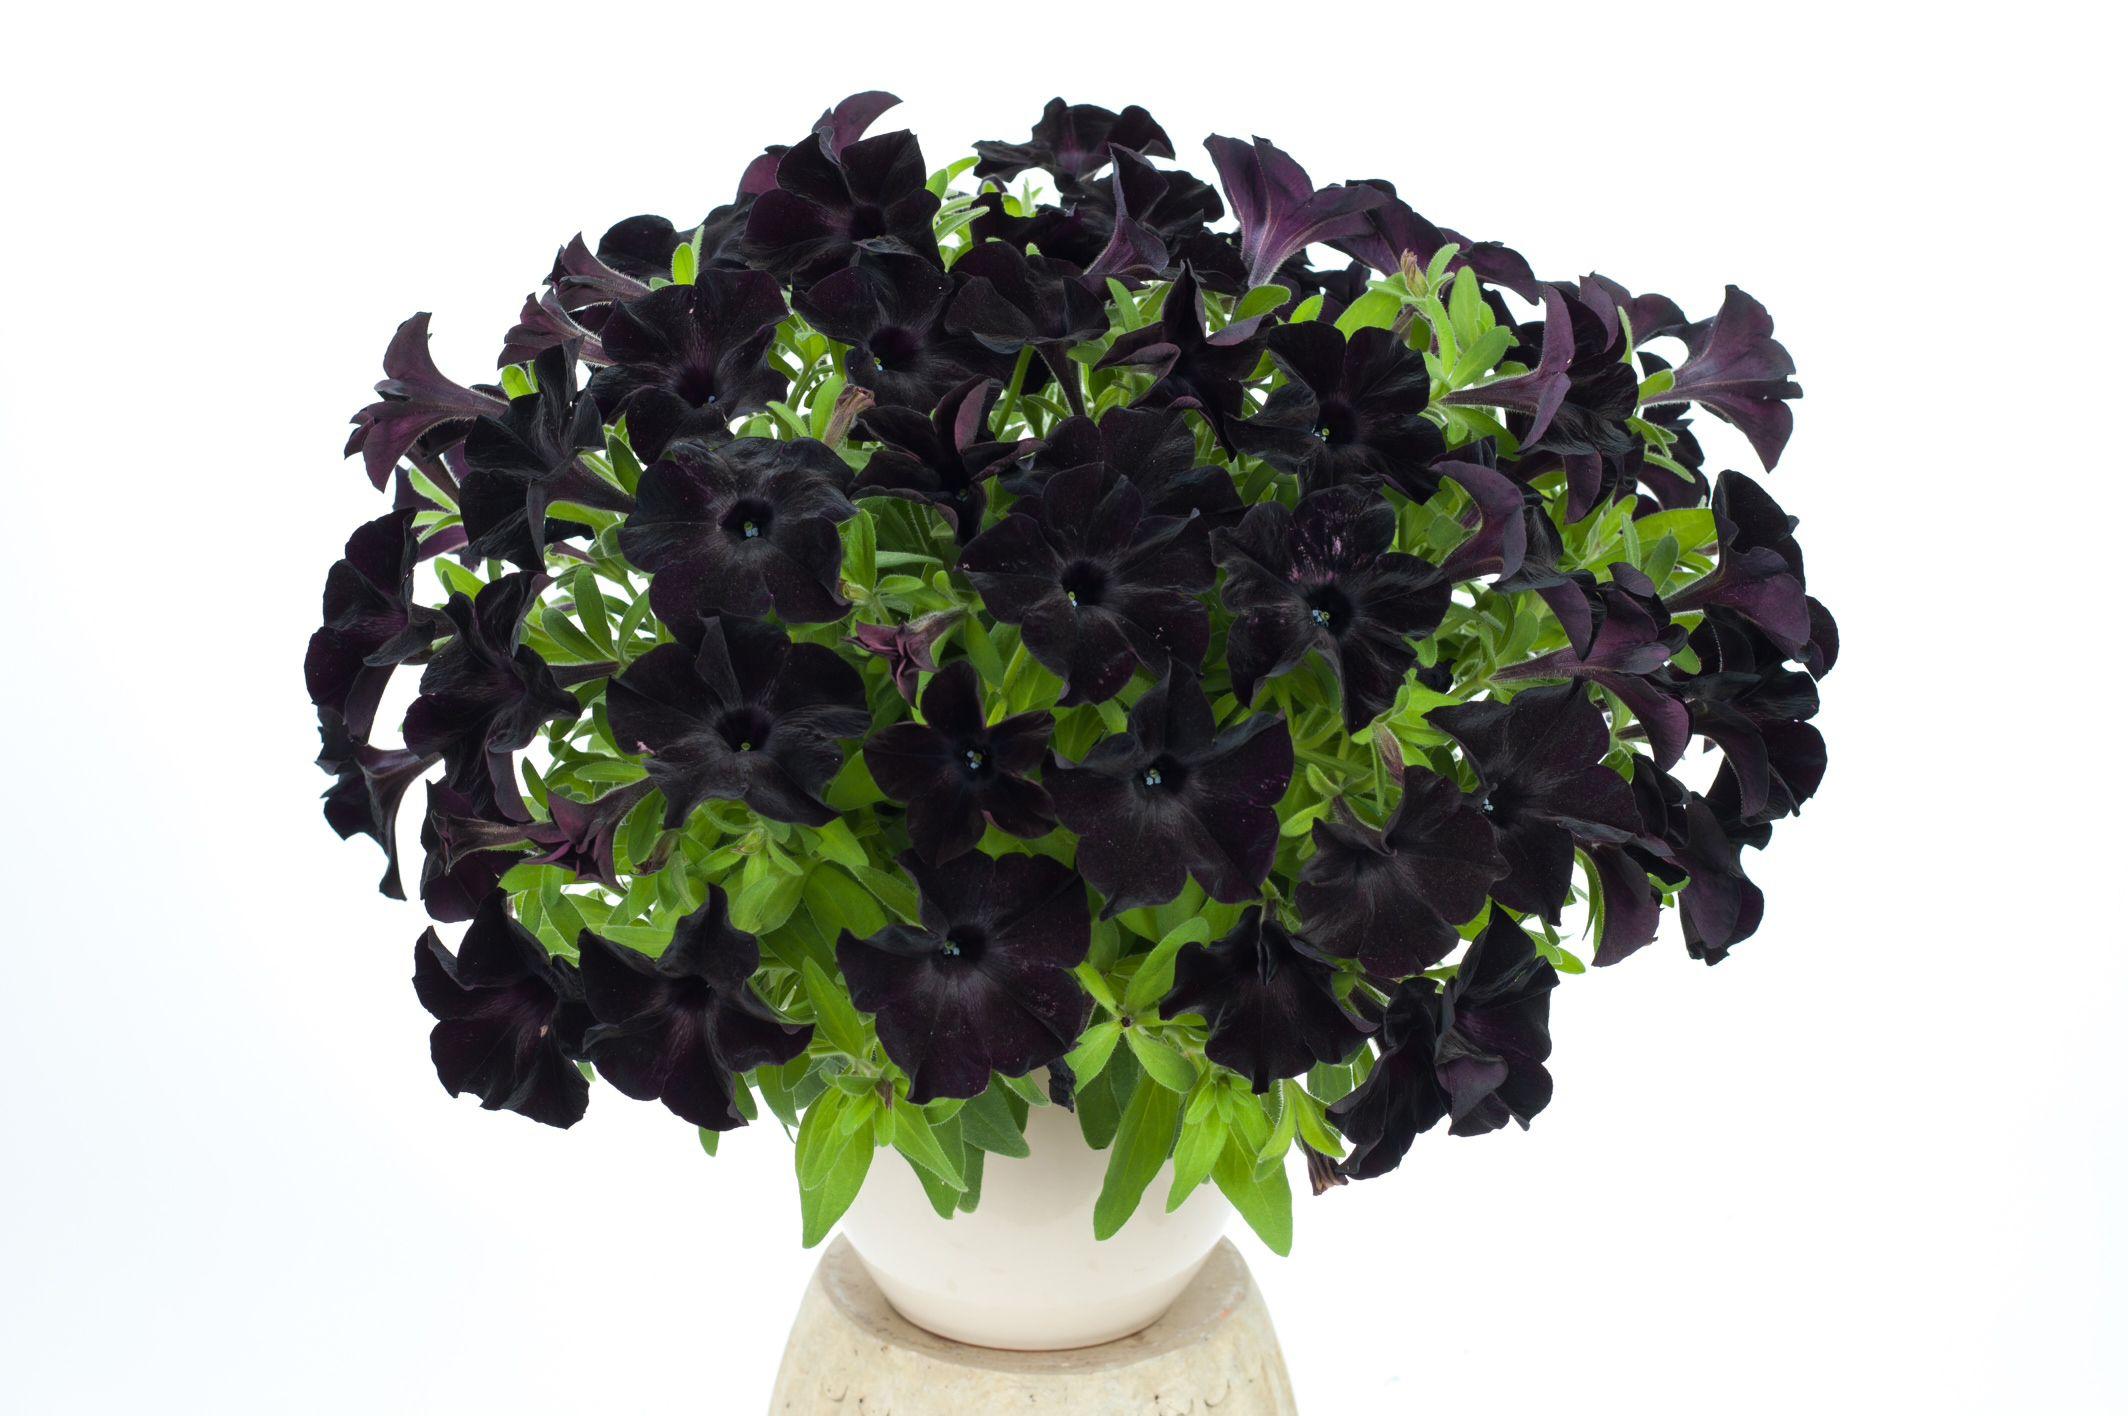 Petunia Black Magic Ball Horticultural Co Petunia Flower Black Petunias Plants